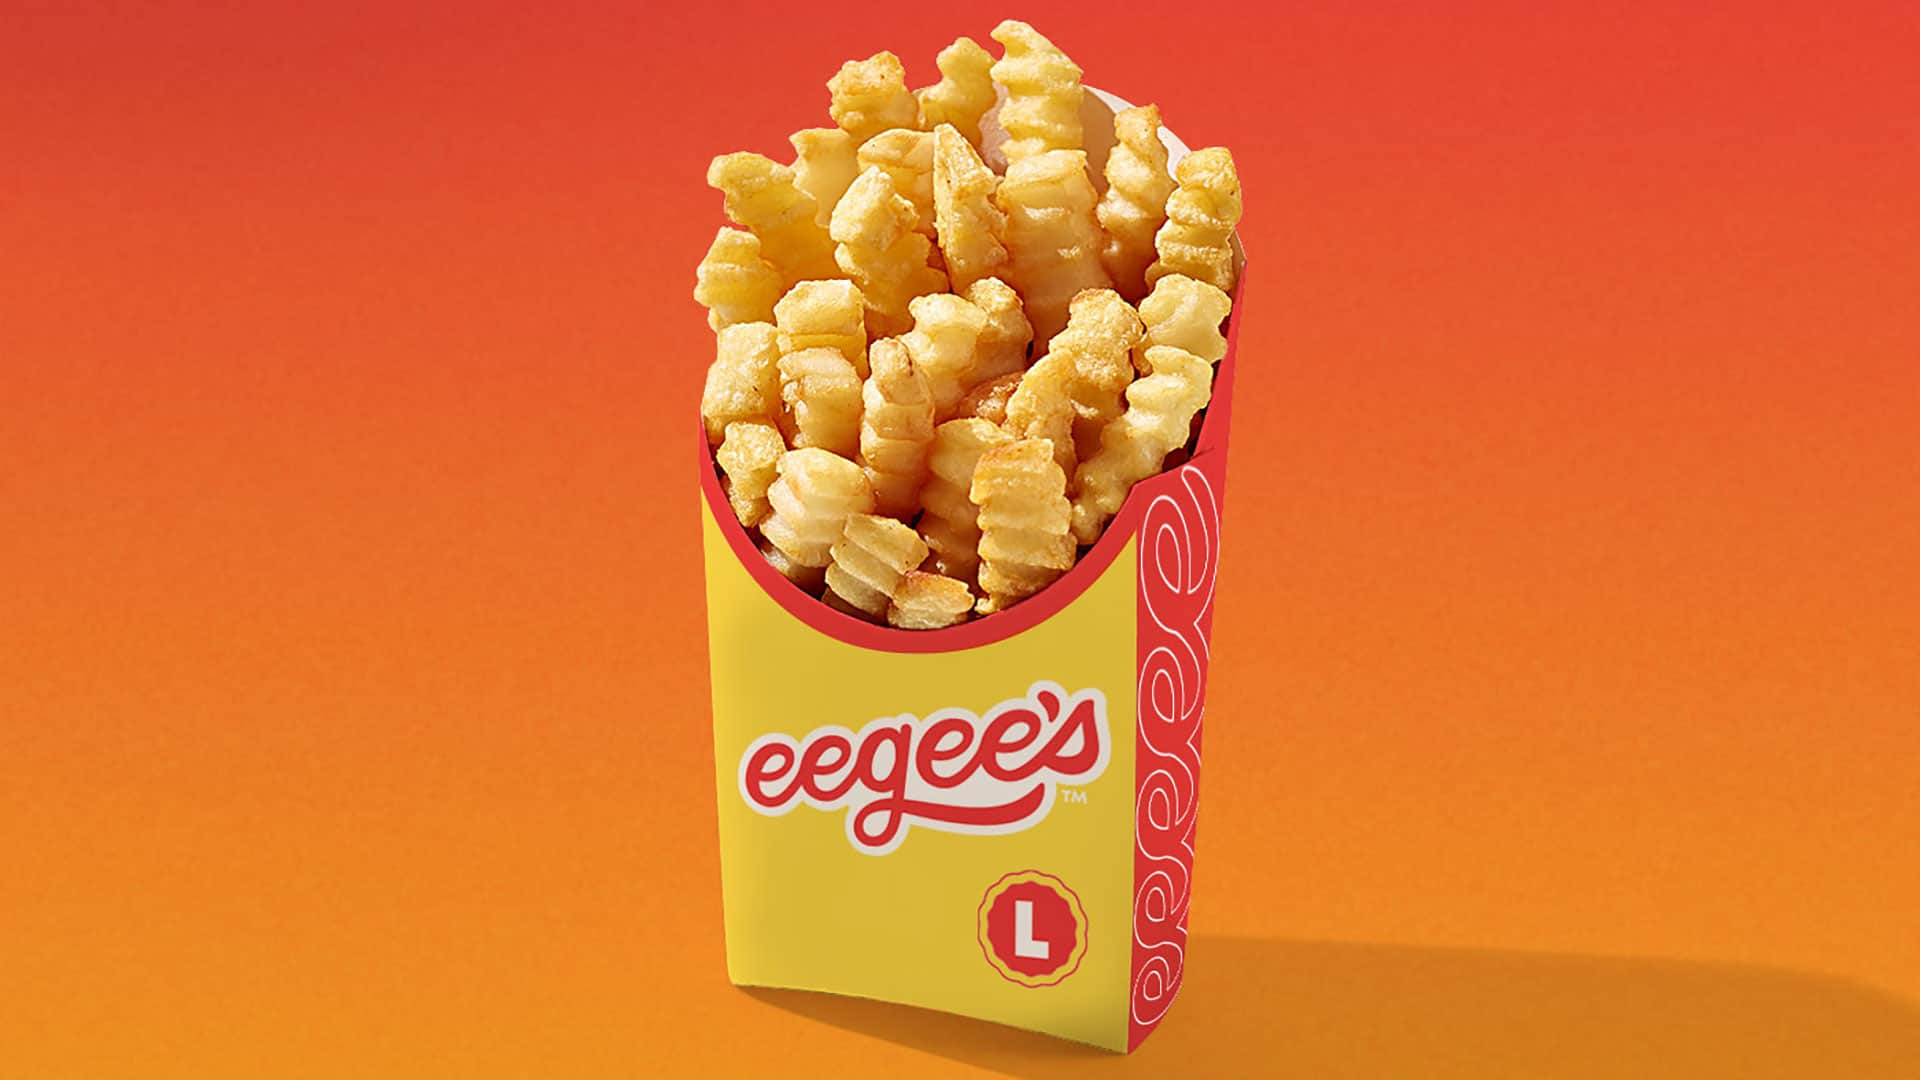 eegee's QSR restaurant rebranding packaging design french fry cartons